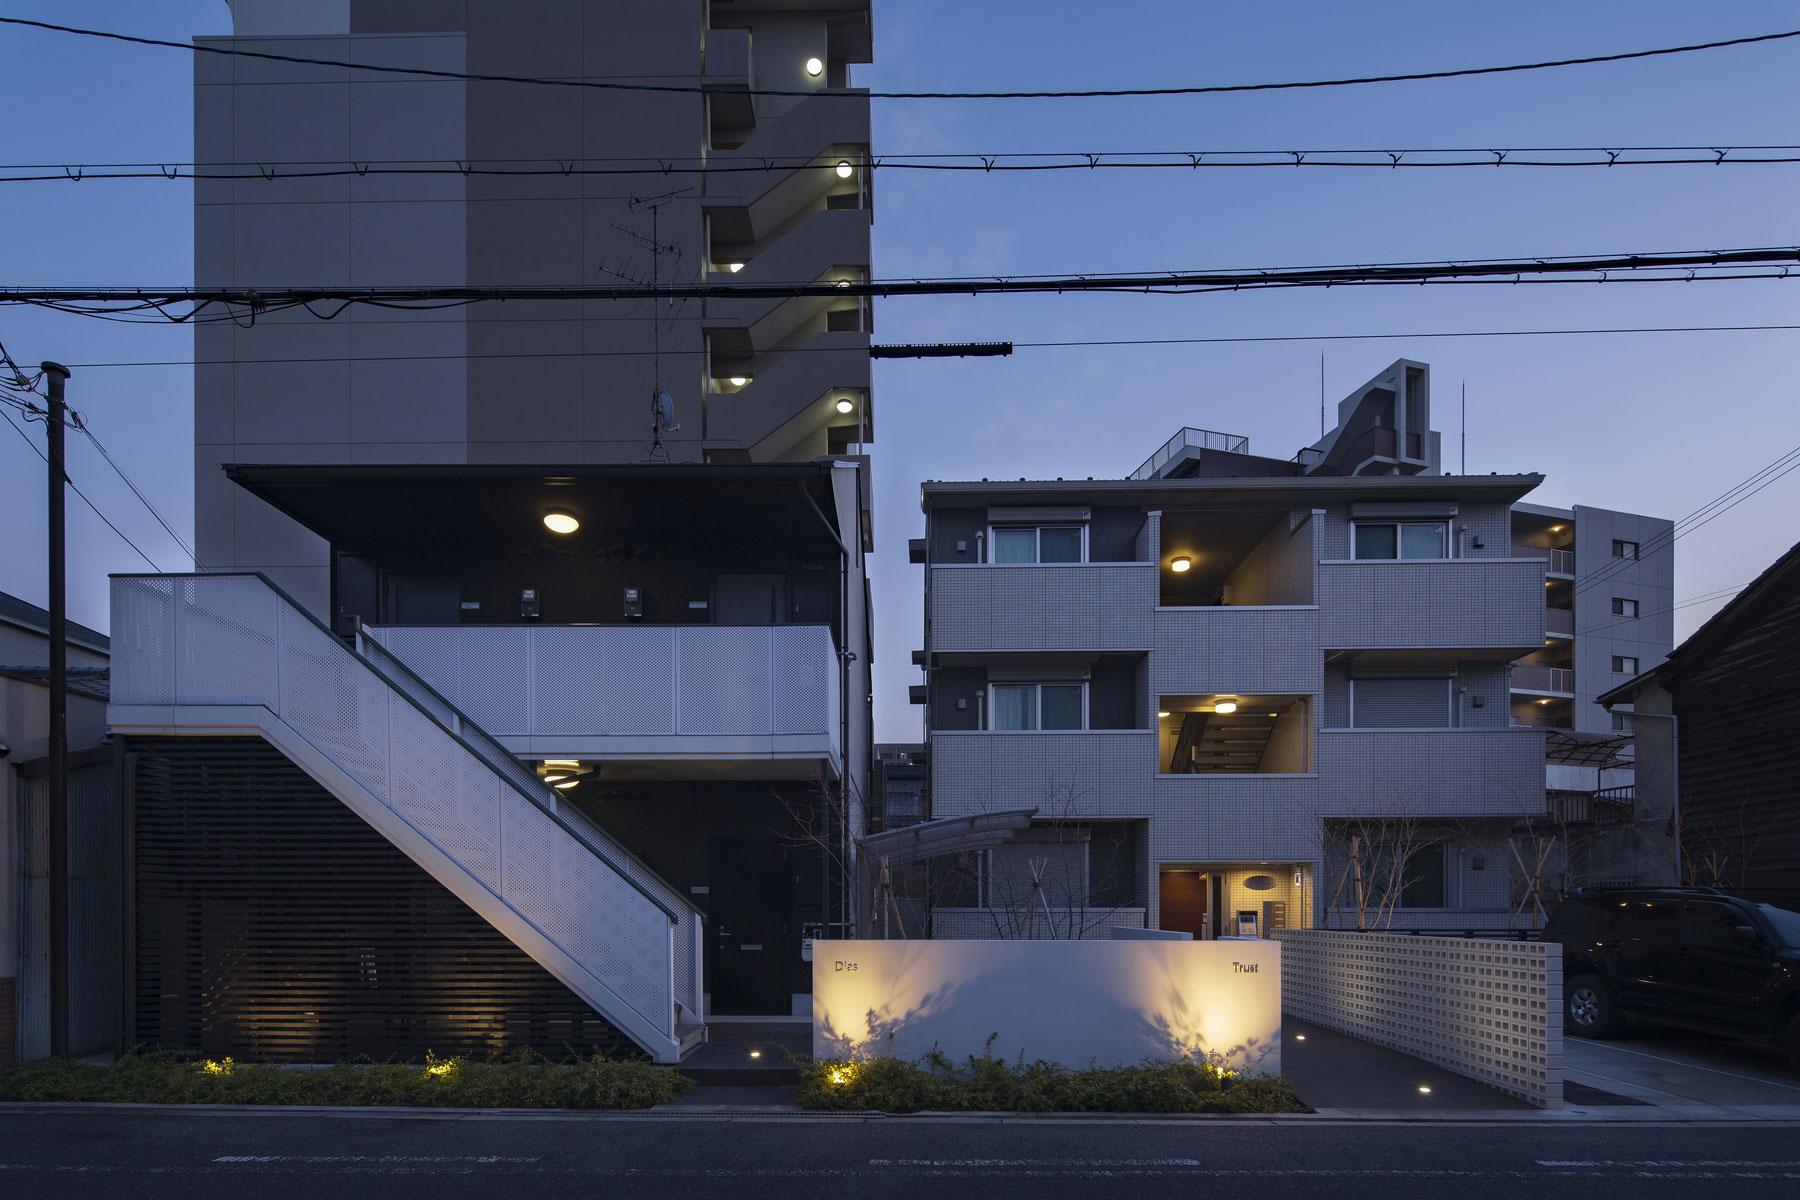 Dias + Trust Exterior Renovation|隣り合う賃貸マンションの外構